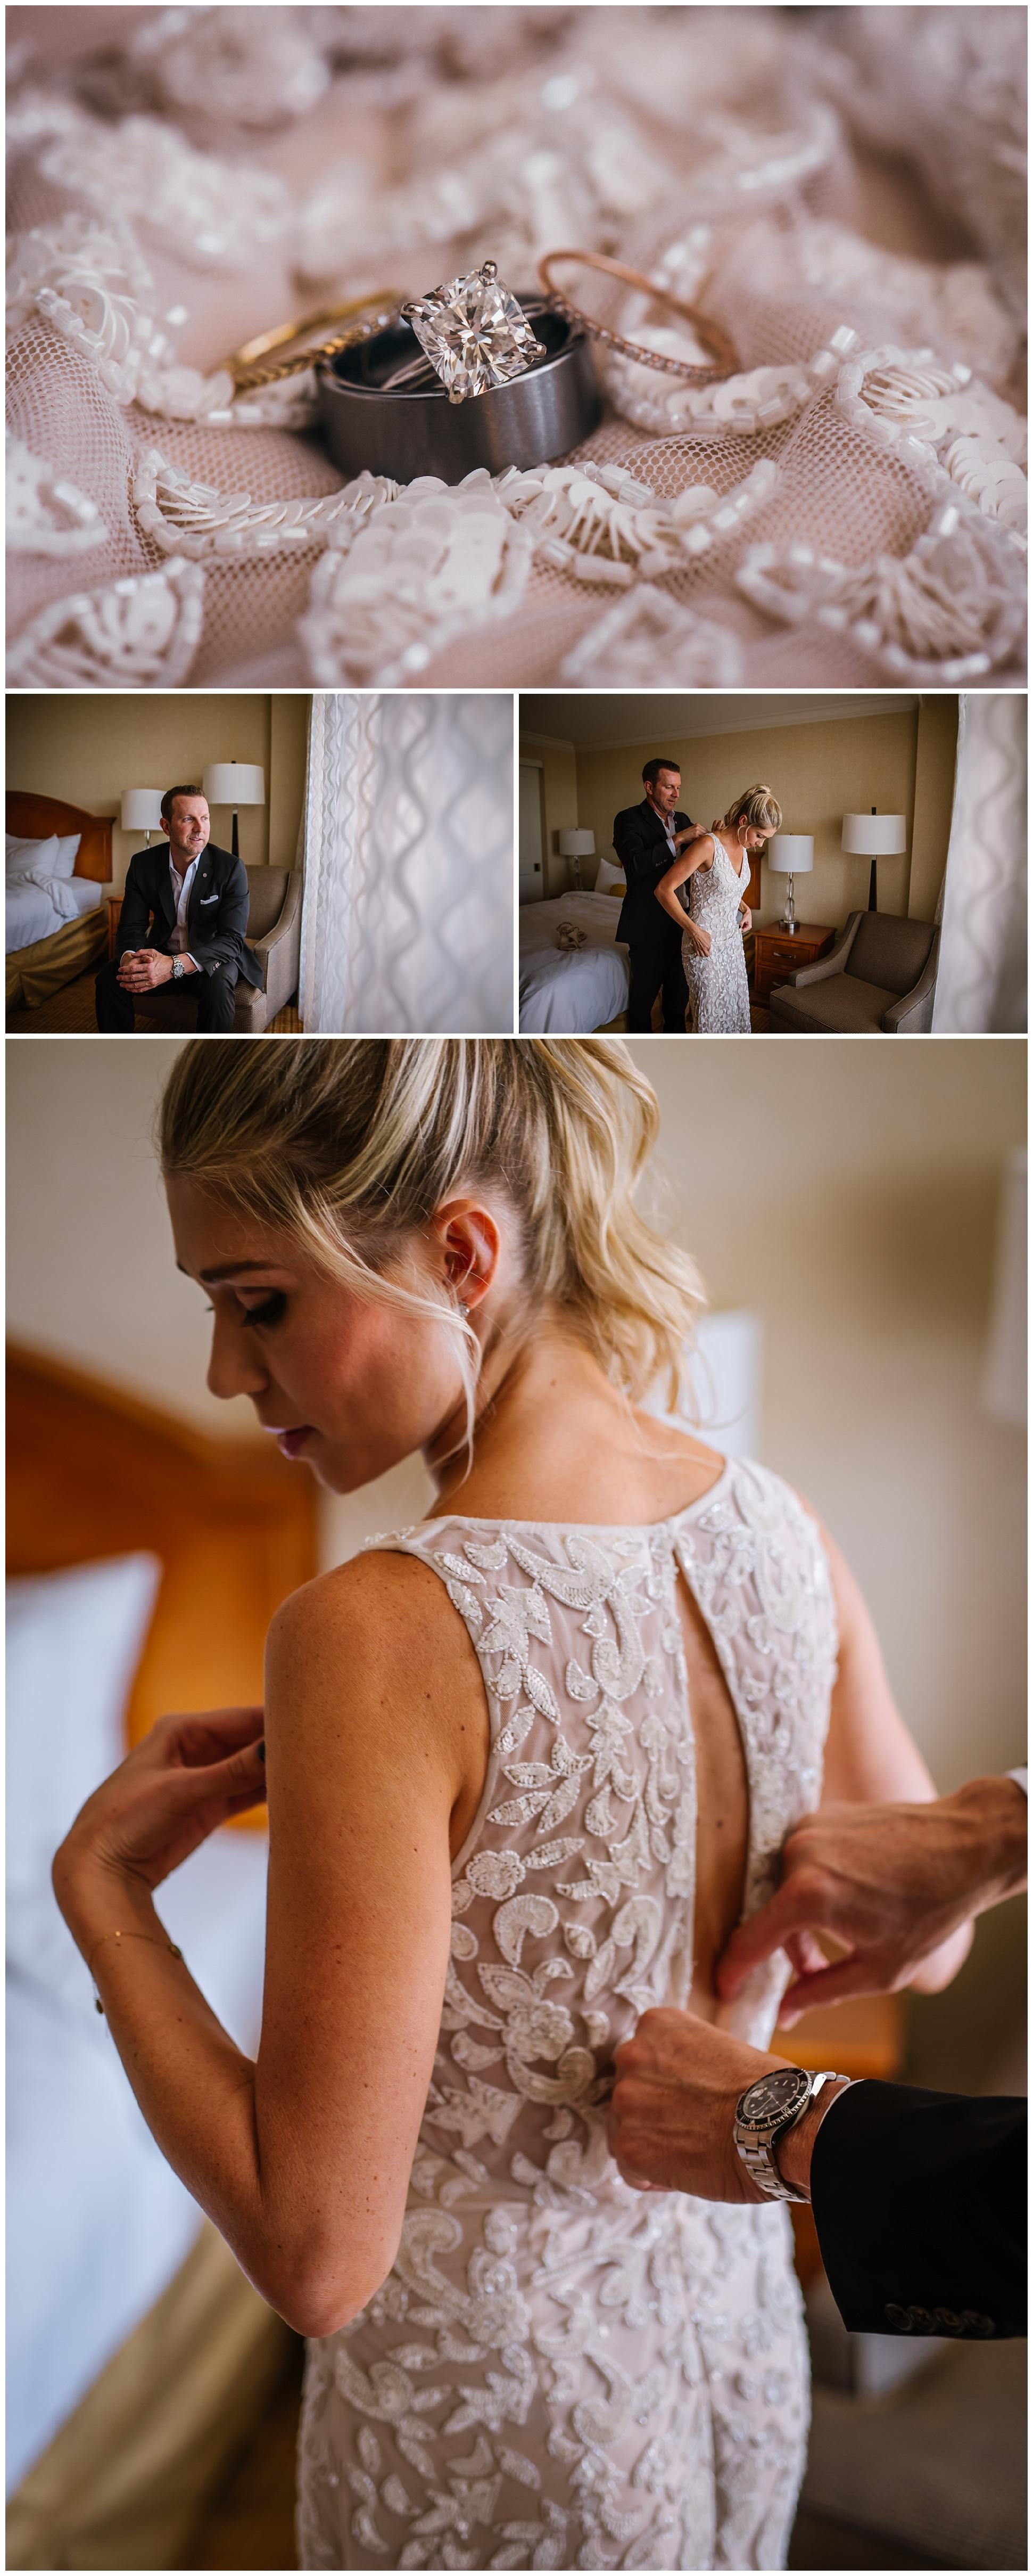 Ashlee-hamon-photography-year-in-review-2016-travel-wanderlust-vsco-adventure-wedding_0094.jpg